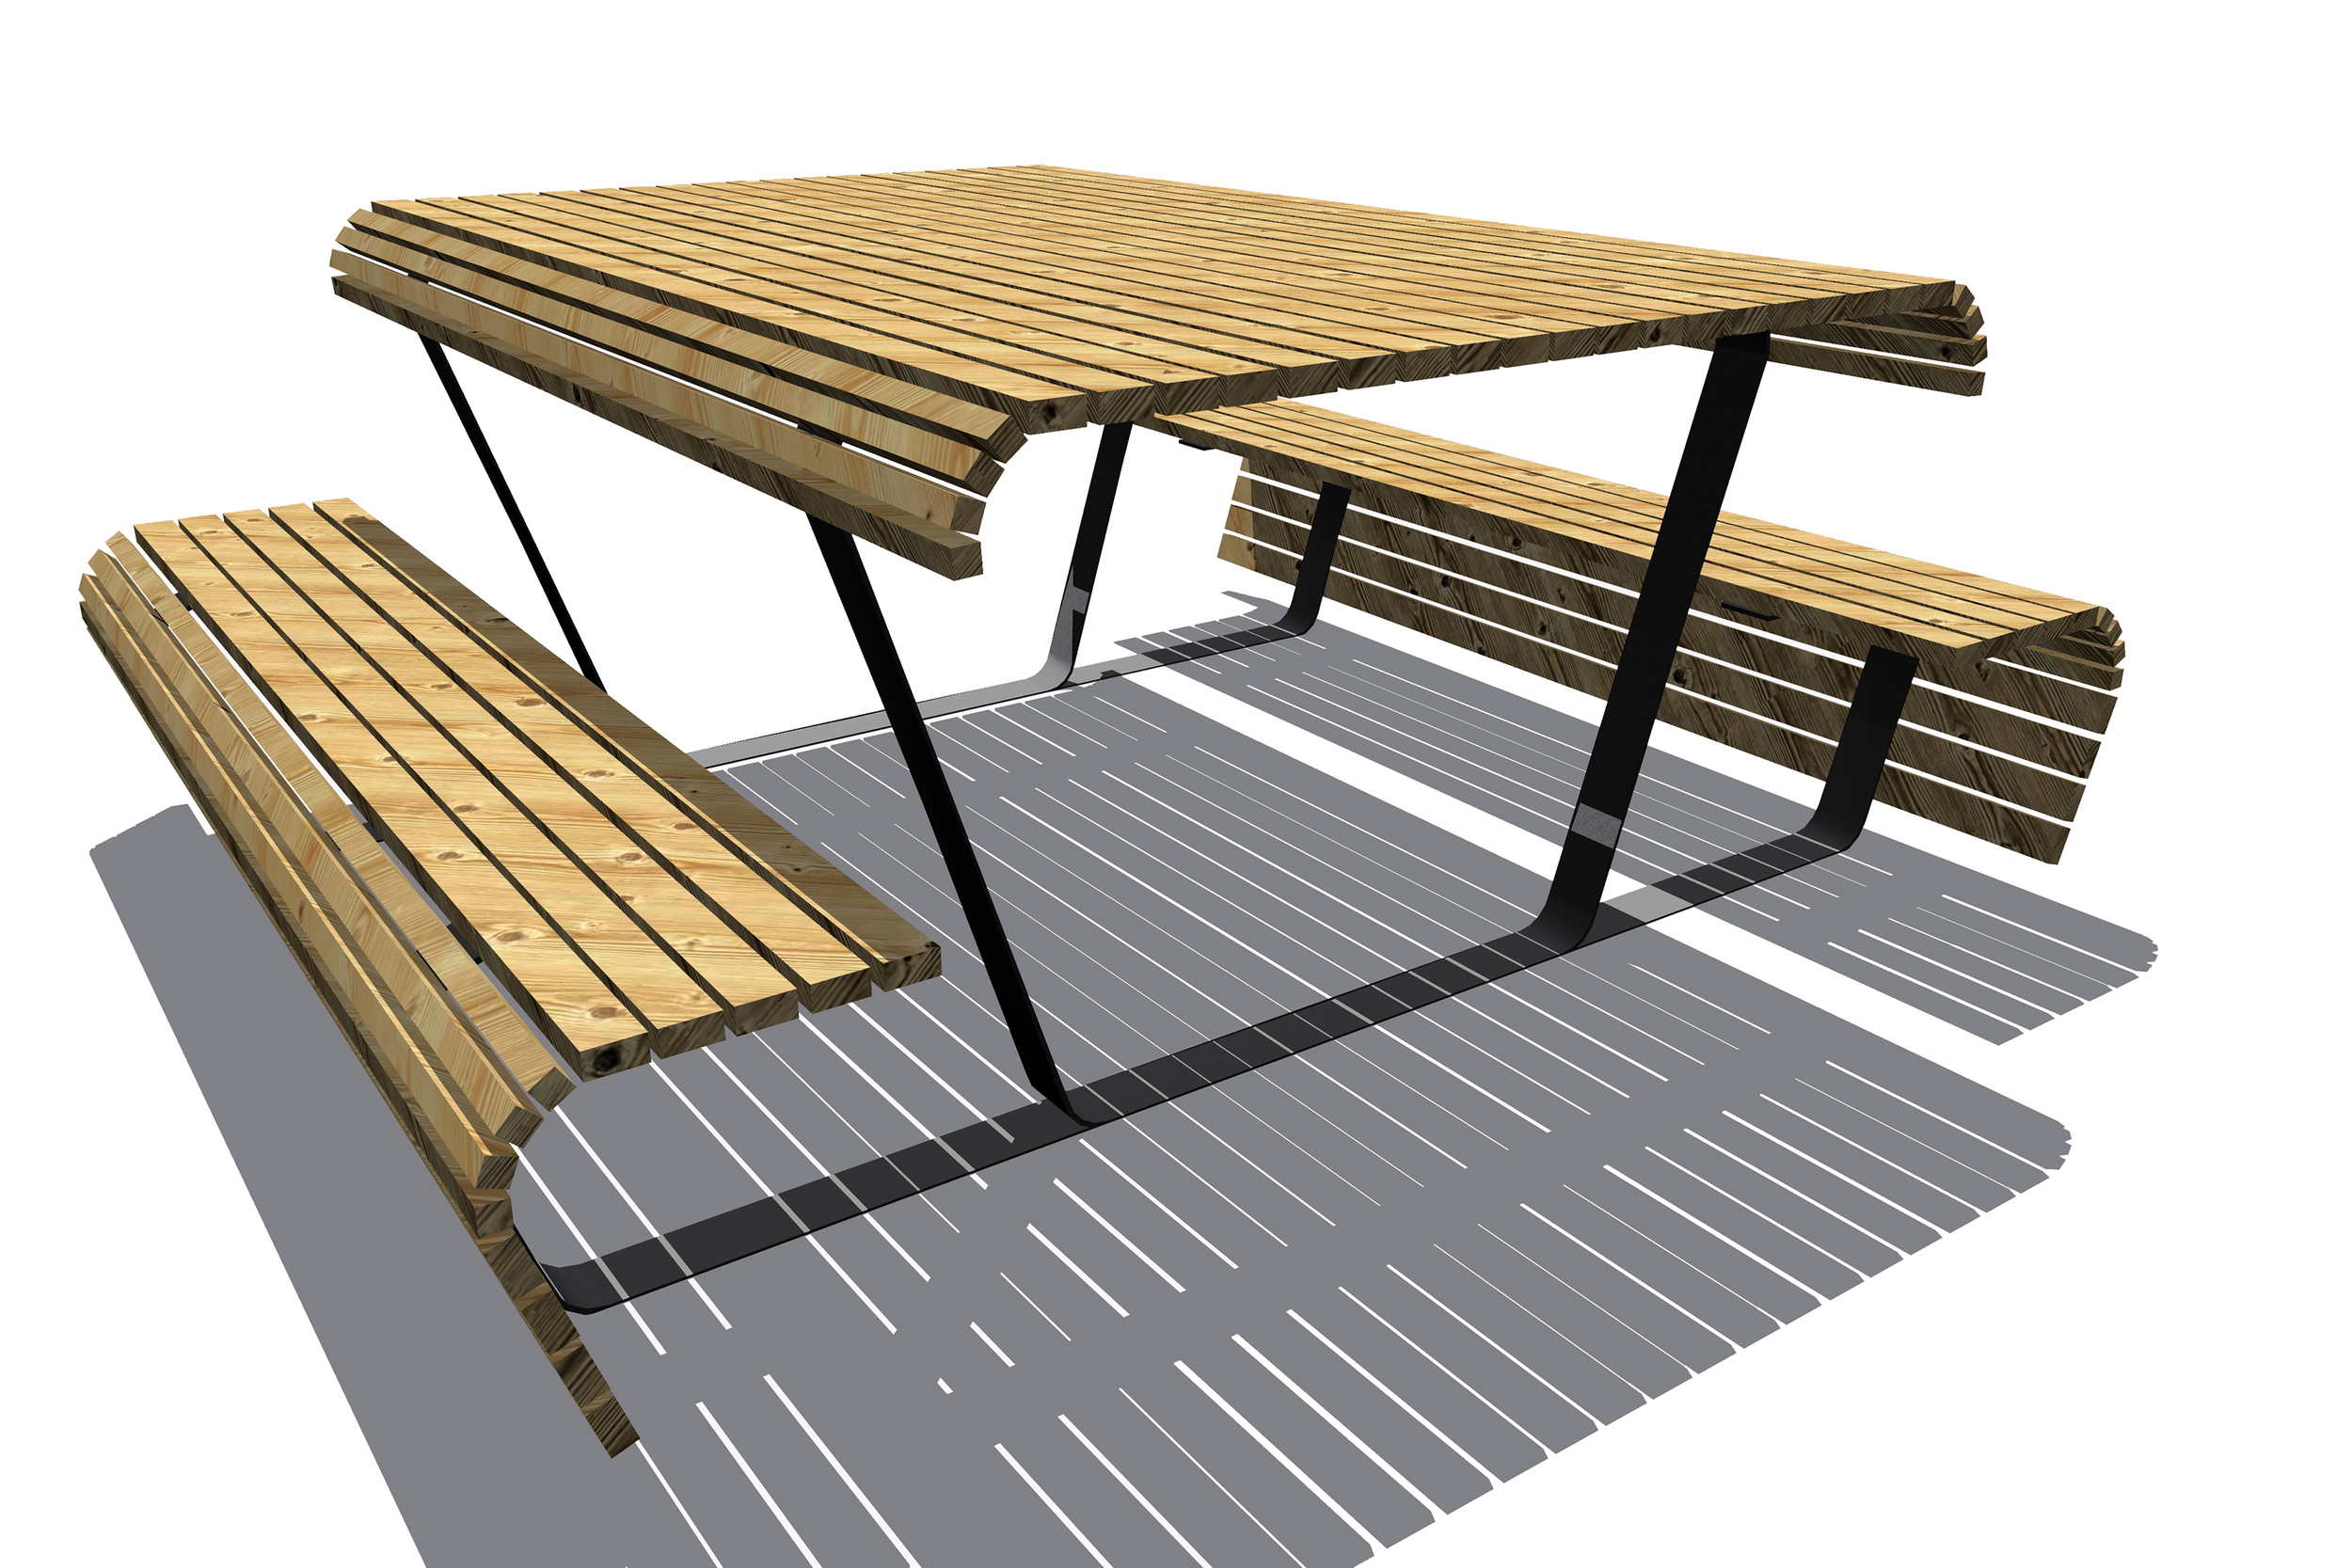 Picnic Table 5.jpg